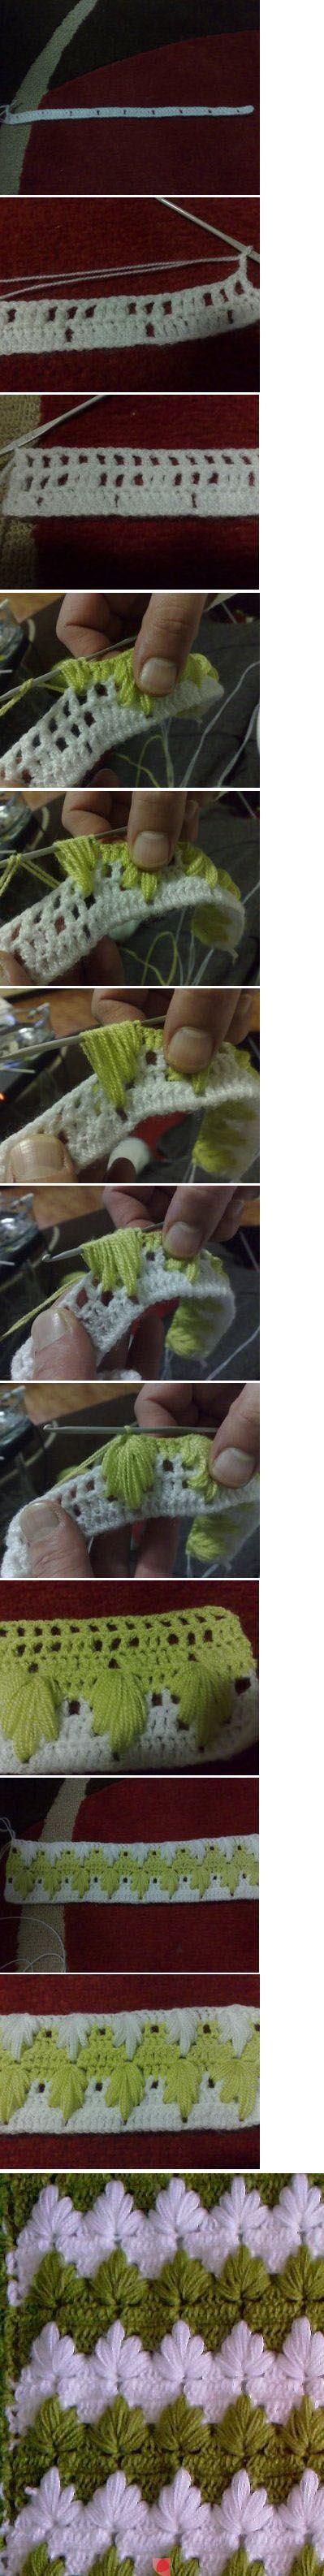 Extravagant stitch!